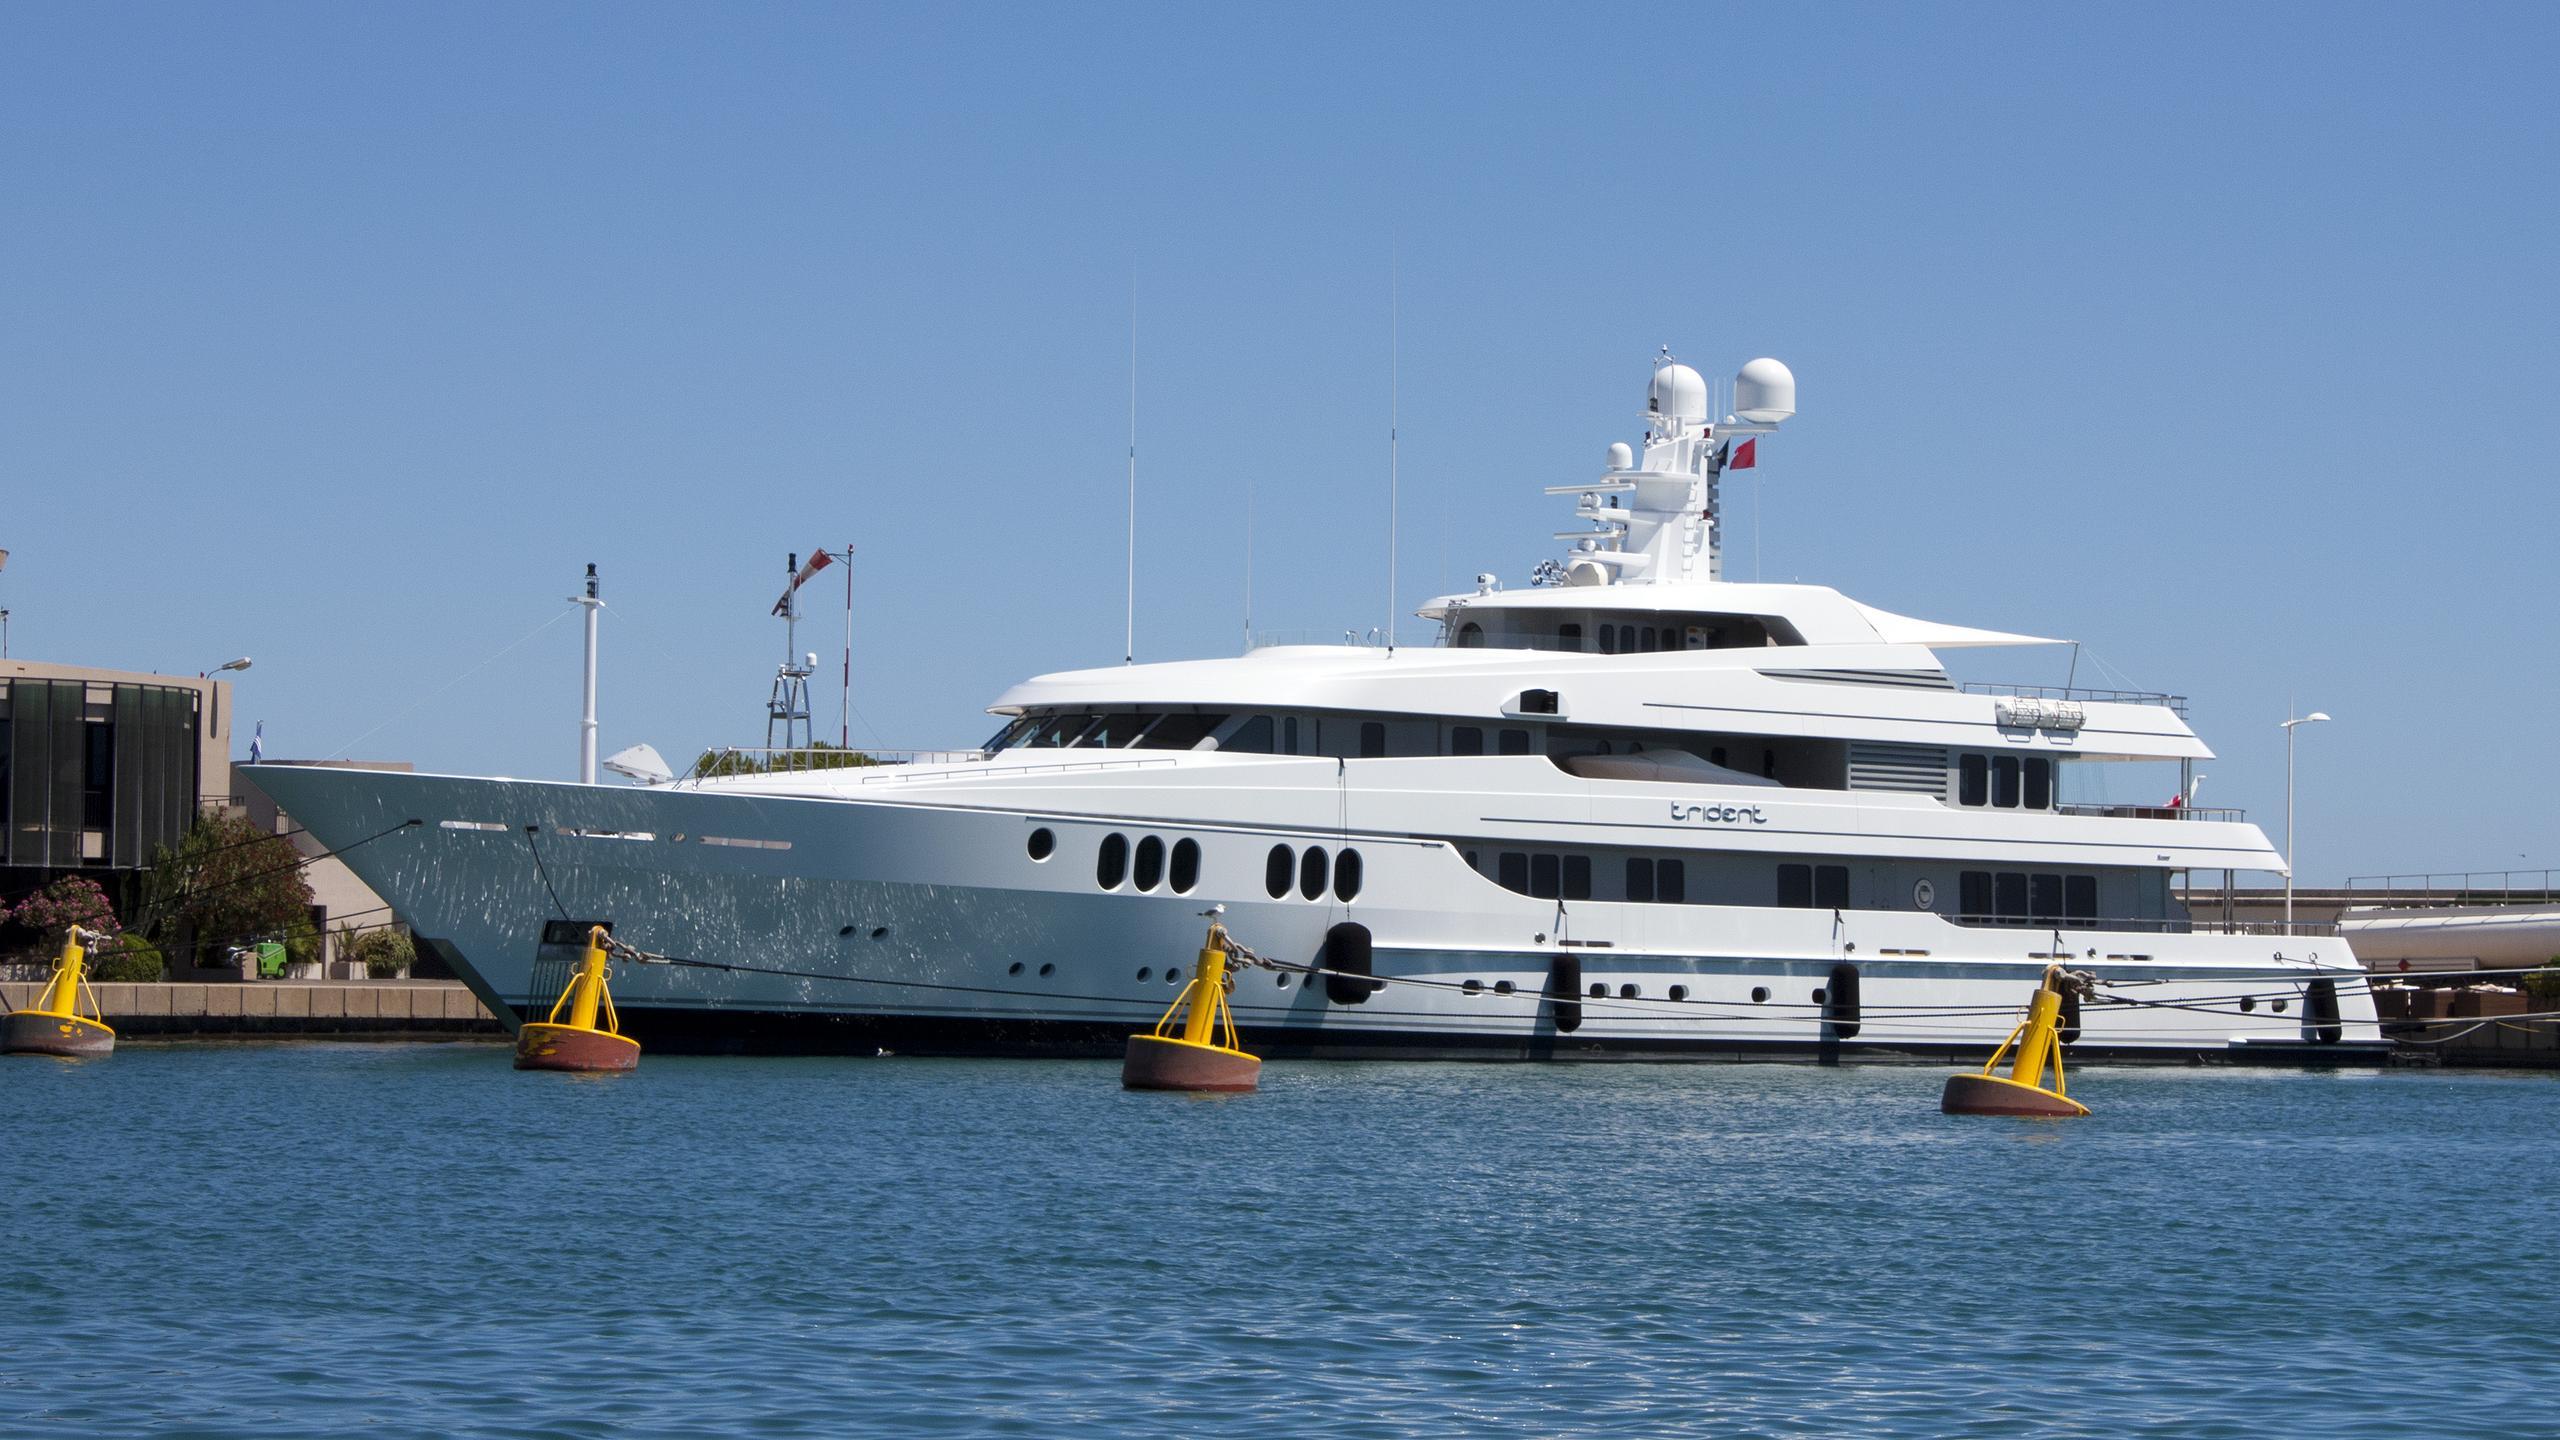 trident-motor-yacht-feadship-2009-65m-profile